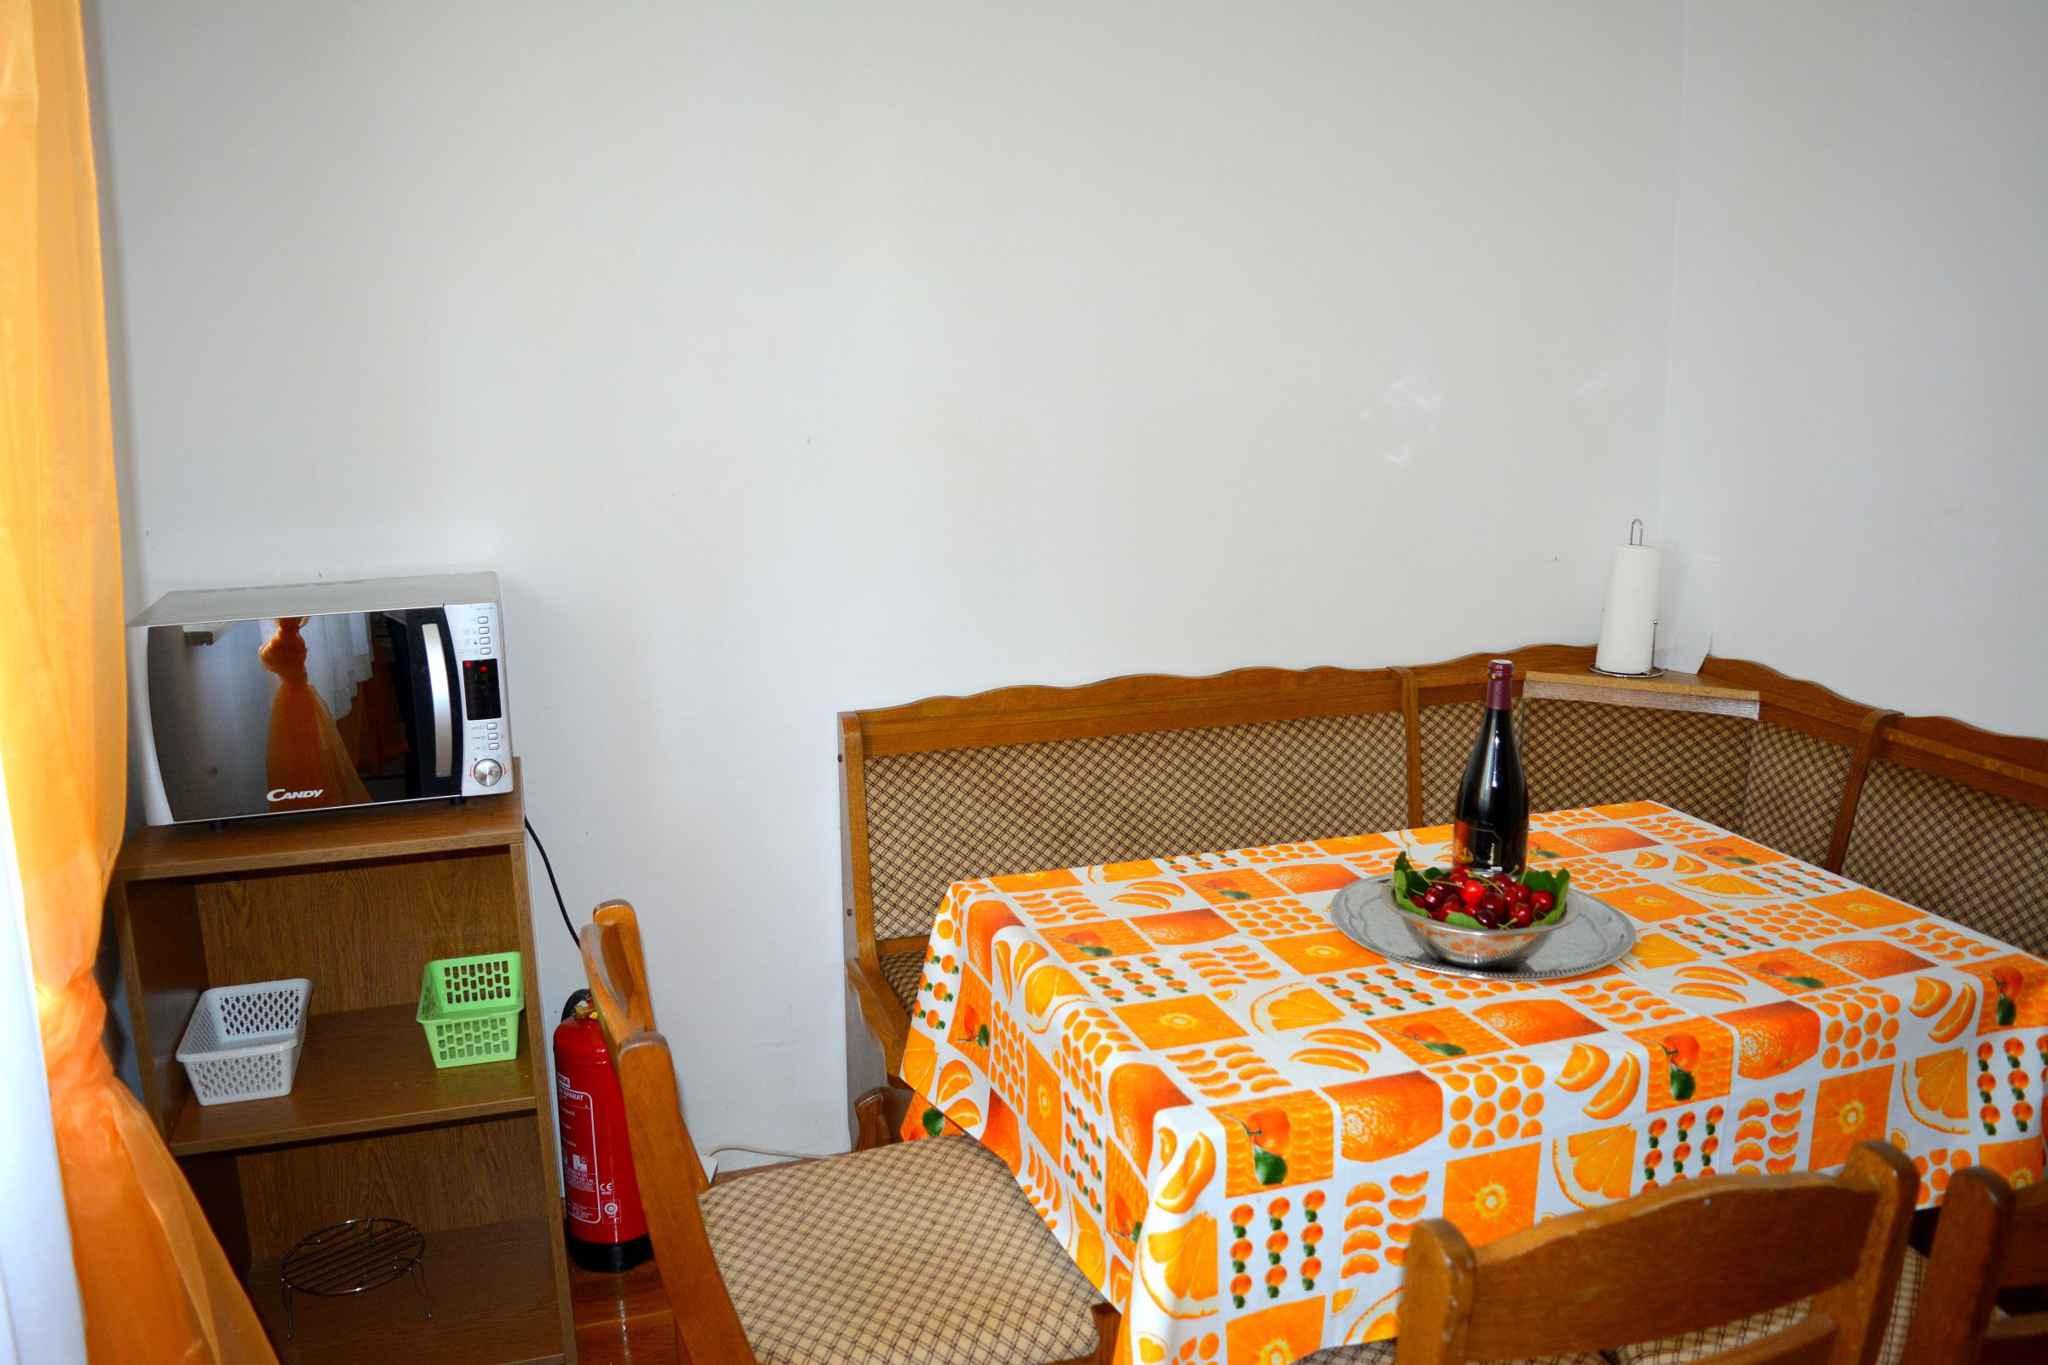 Appartement de vacances mit Terrasse (278776), Vodice, , Dalmatie, Croatie, image 12